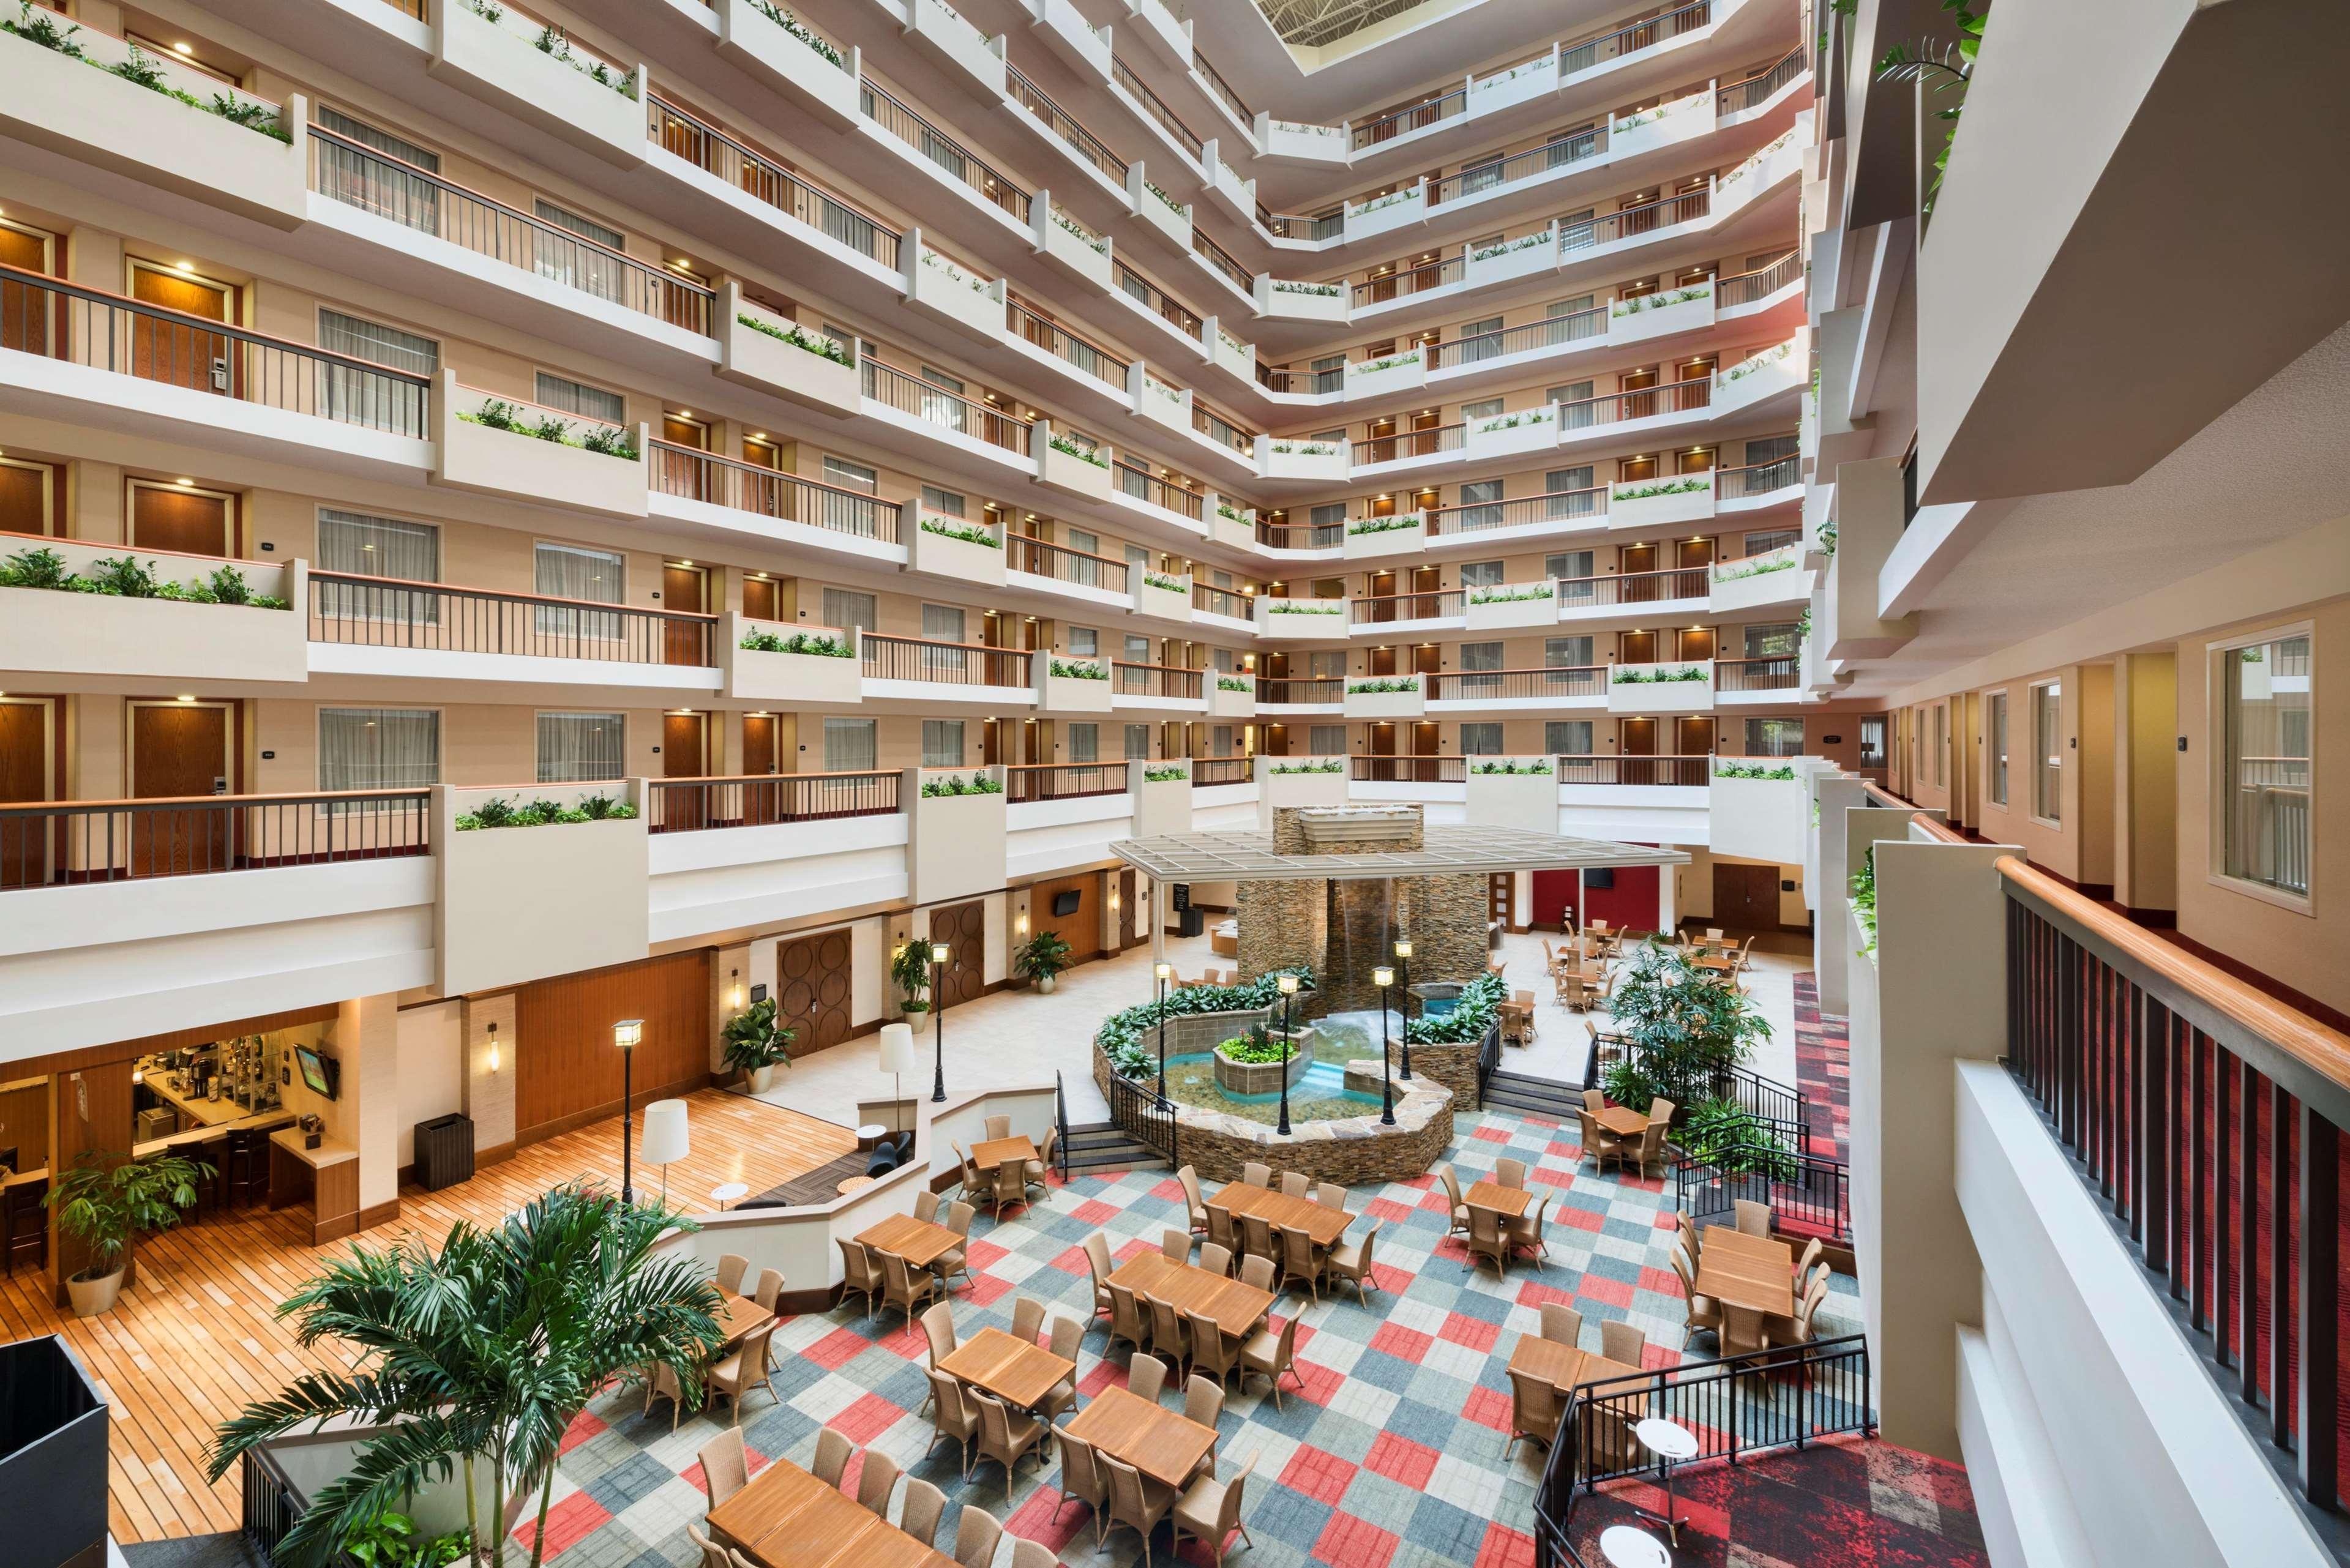 Embassy Suites by Hilton Atlanta Perimeter Center image 15